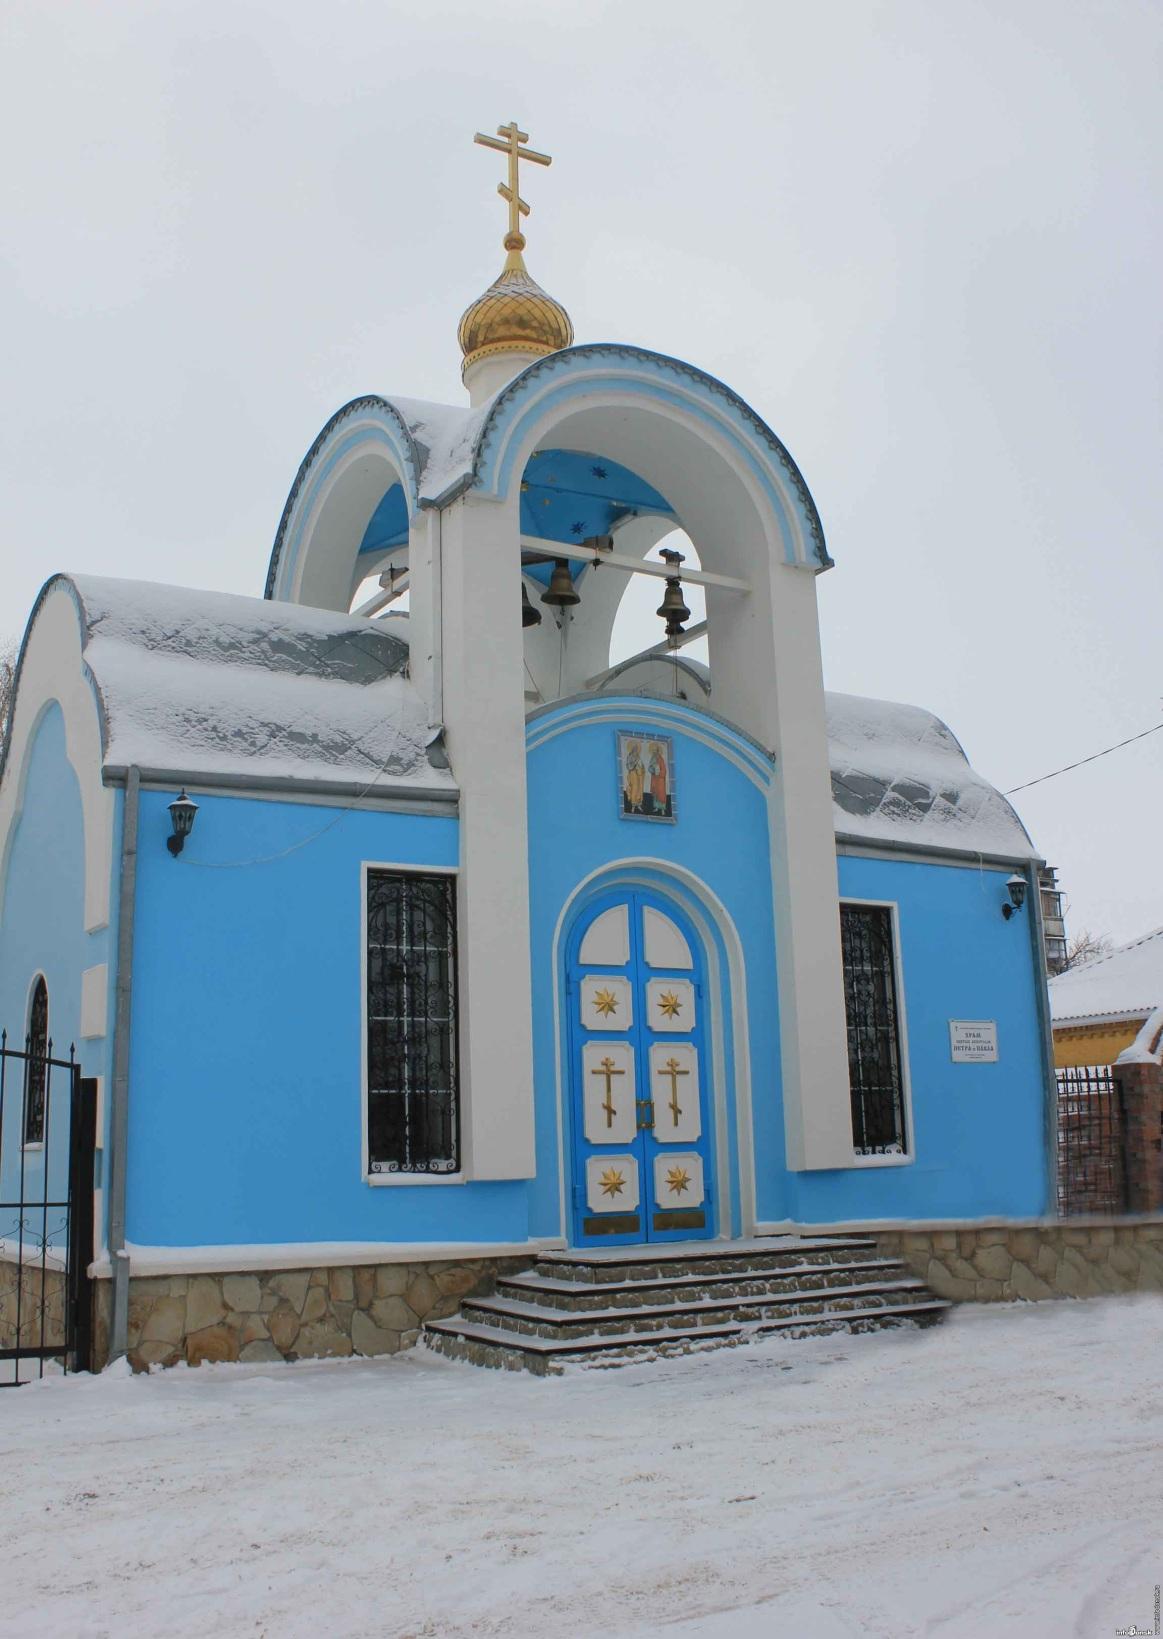 http://infodonsk.ru/images/cerkov_perta_i_pavla2.jpg